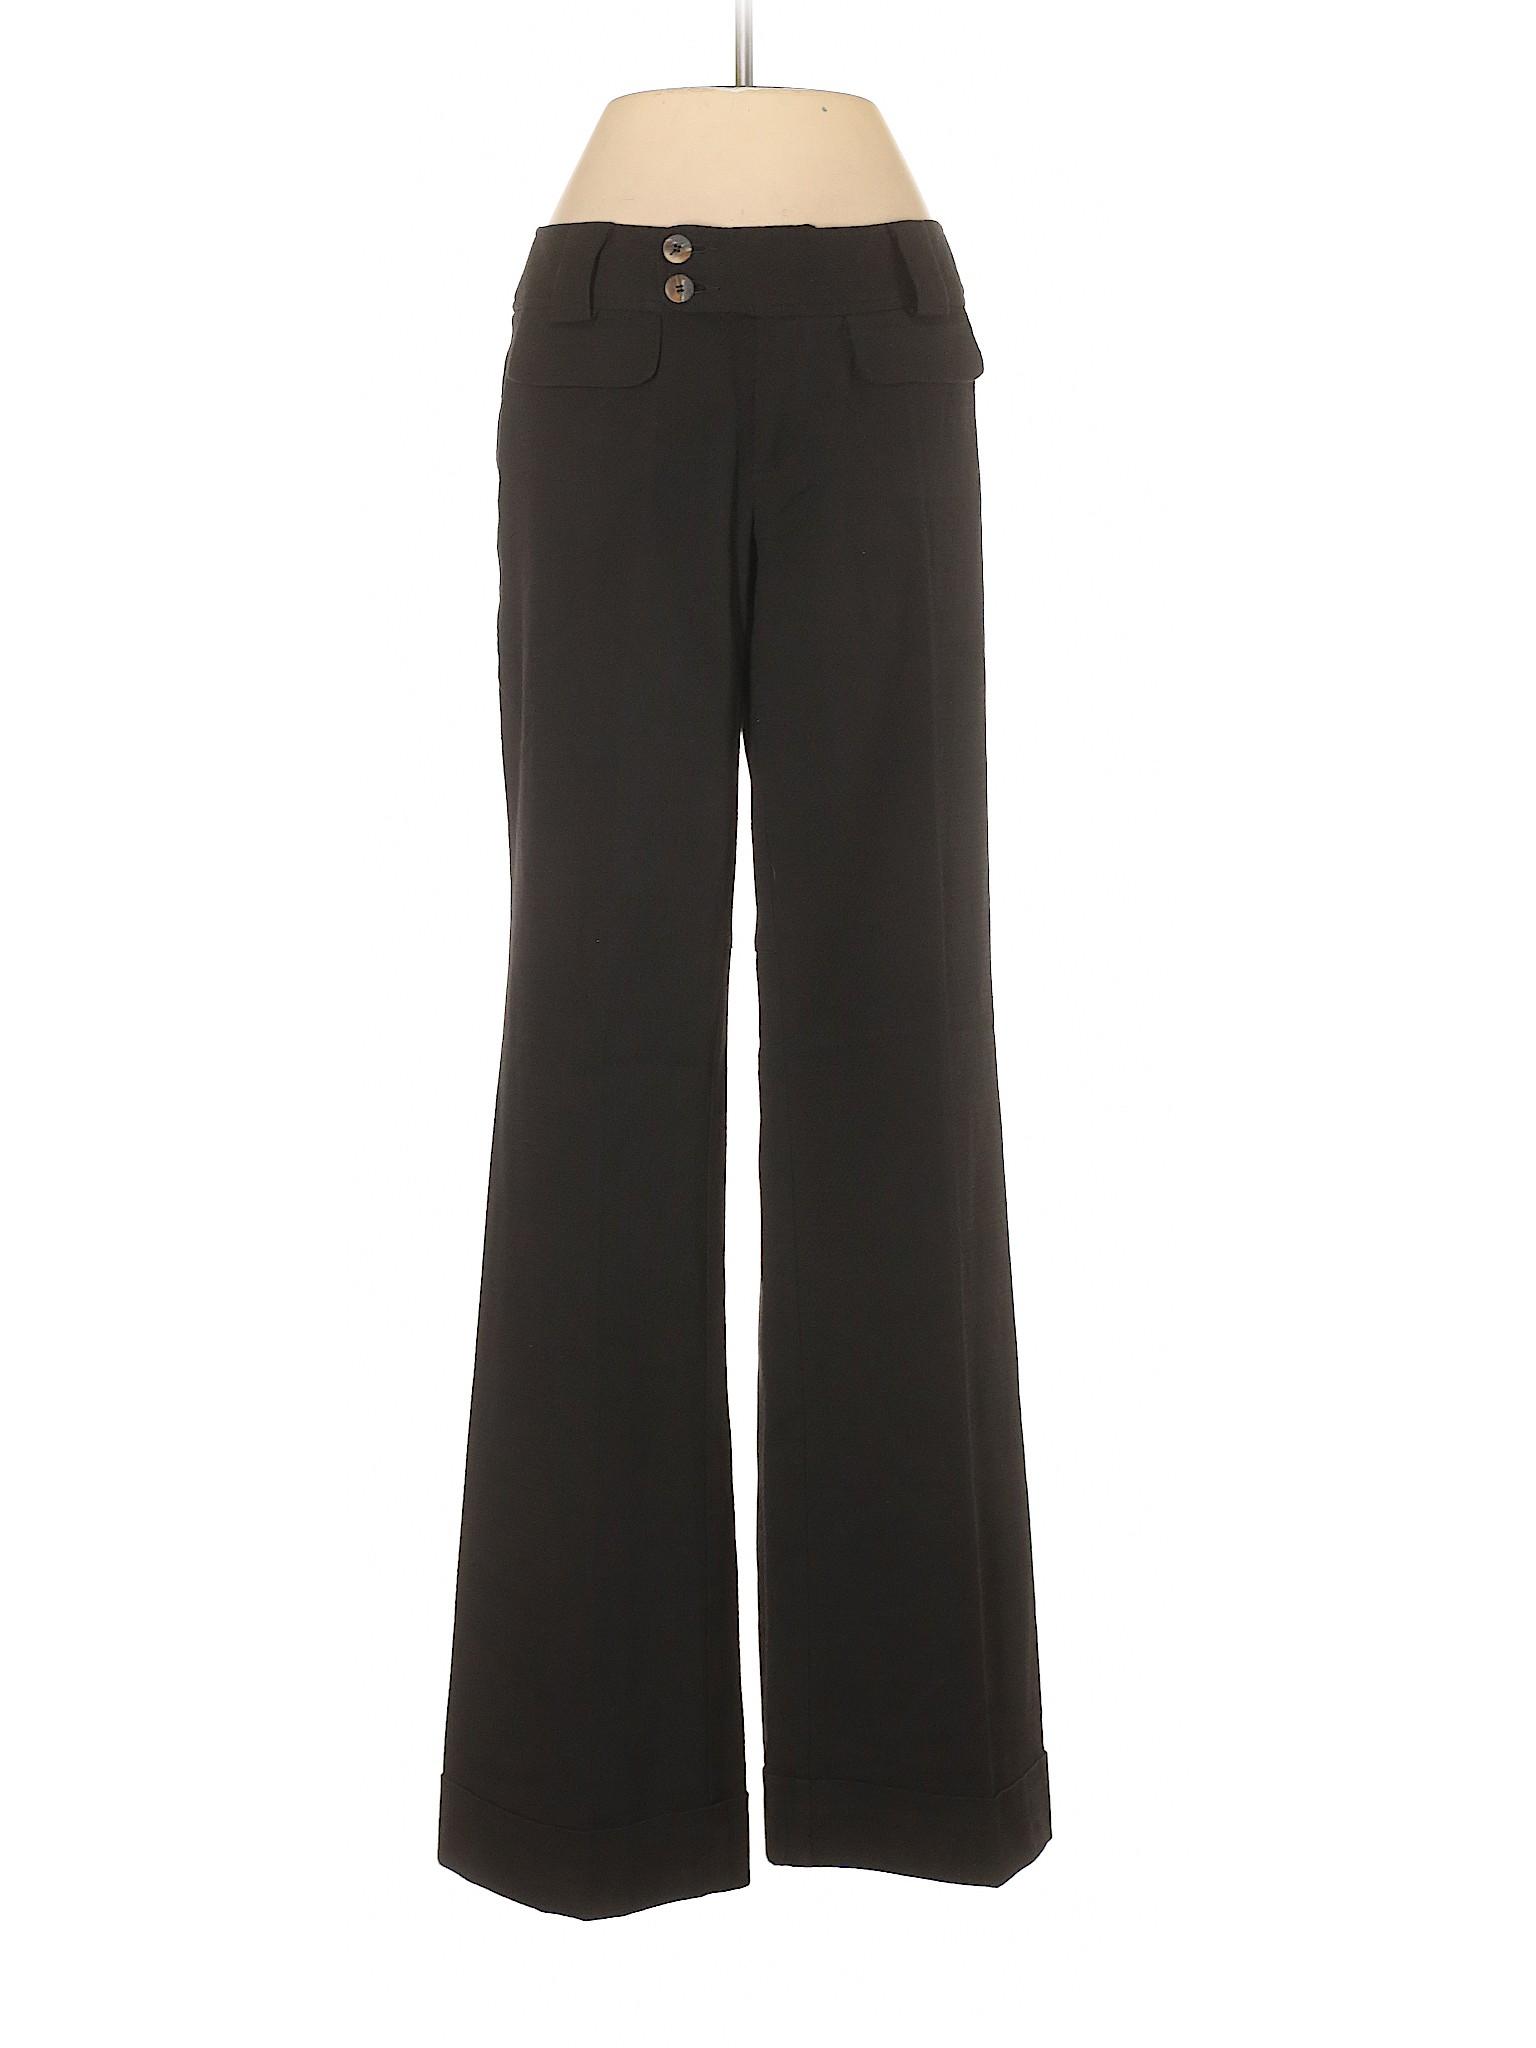 Pants Nanette Boutique Casual leisure Lepore B1x6OnP